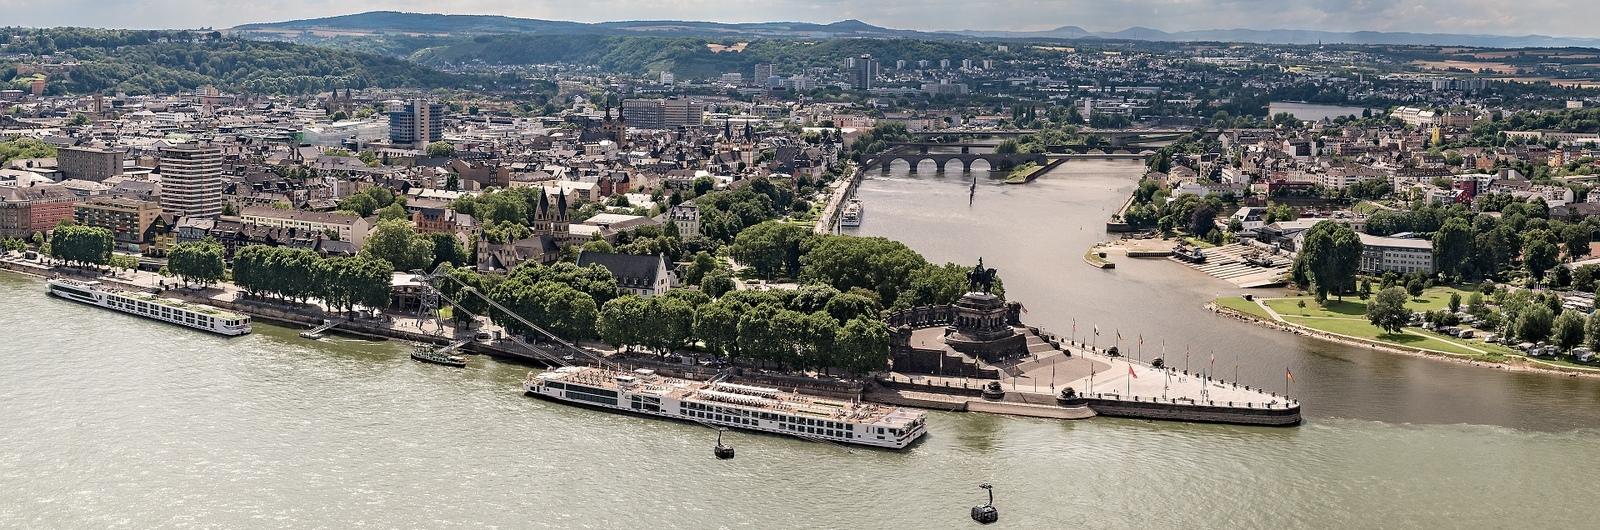 koblenz city header